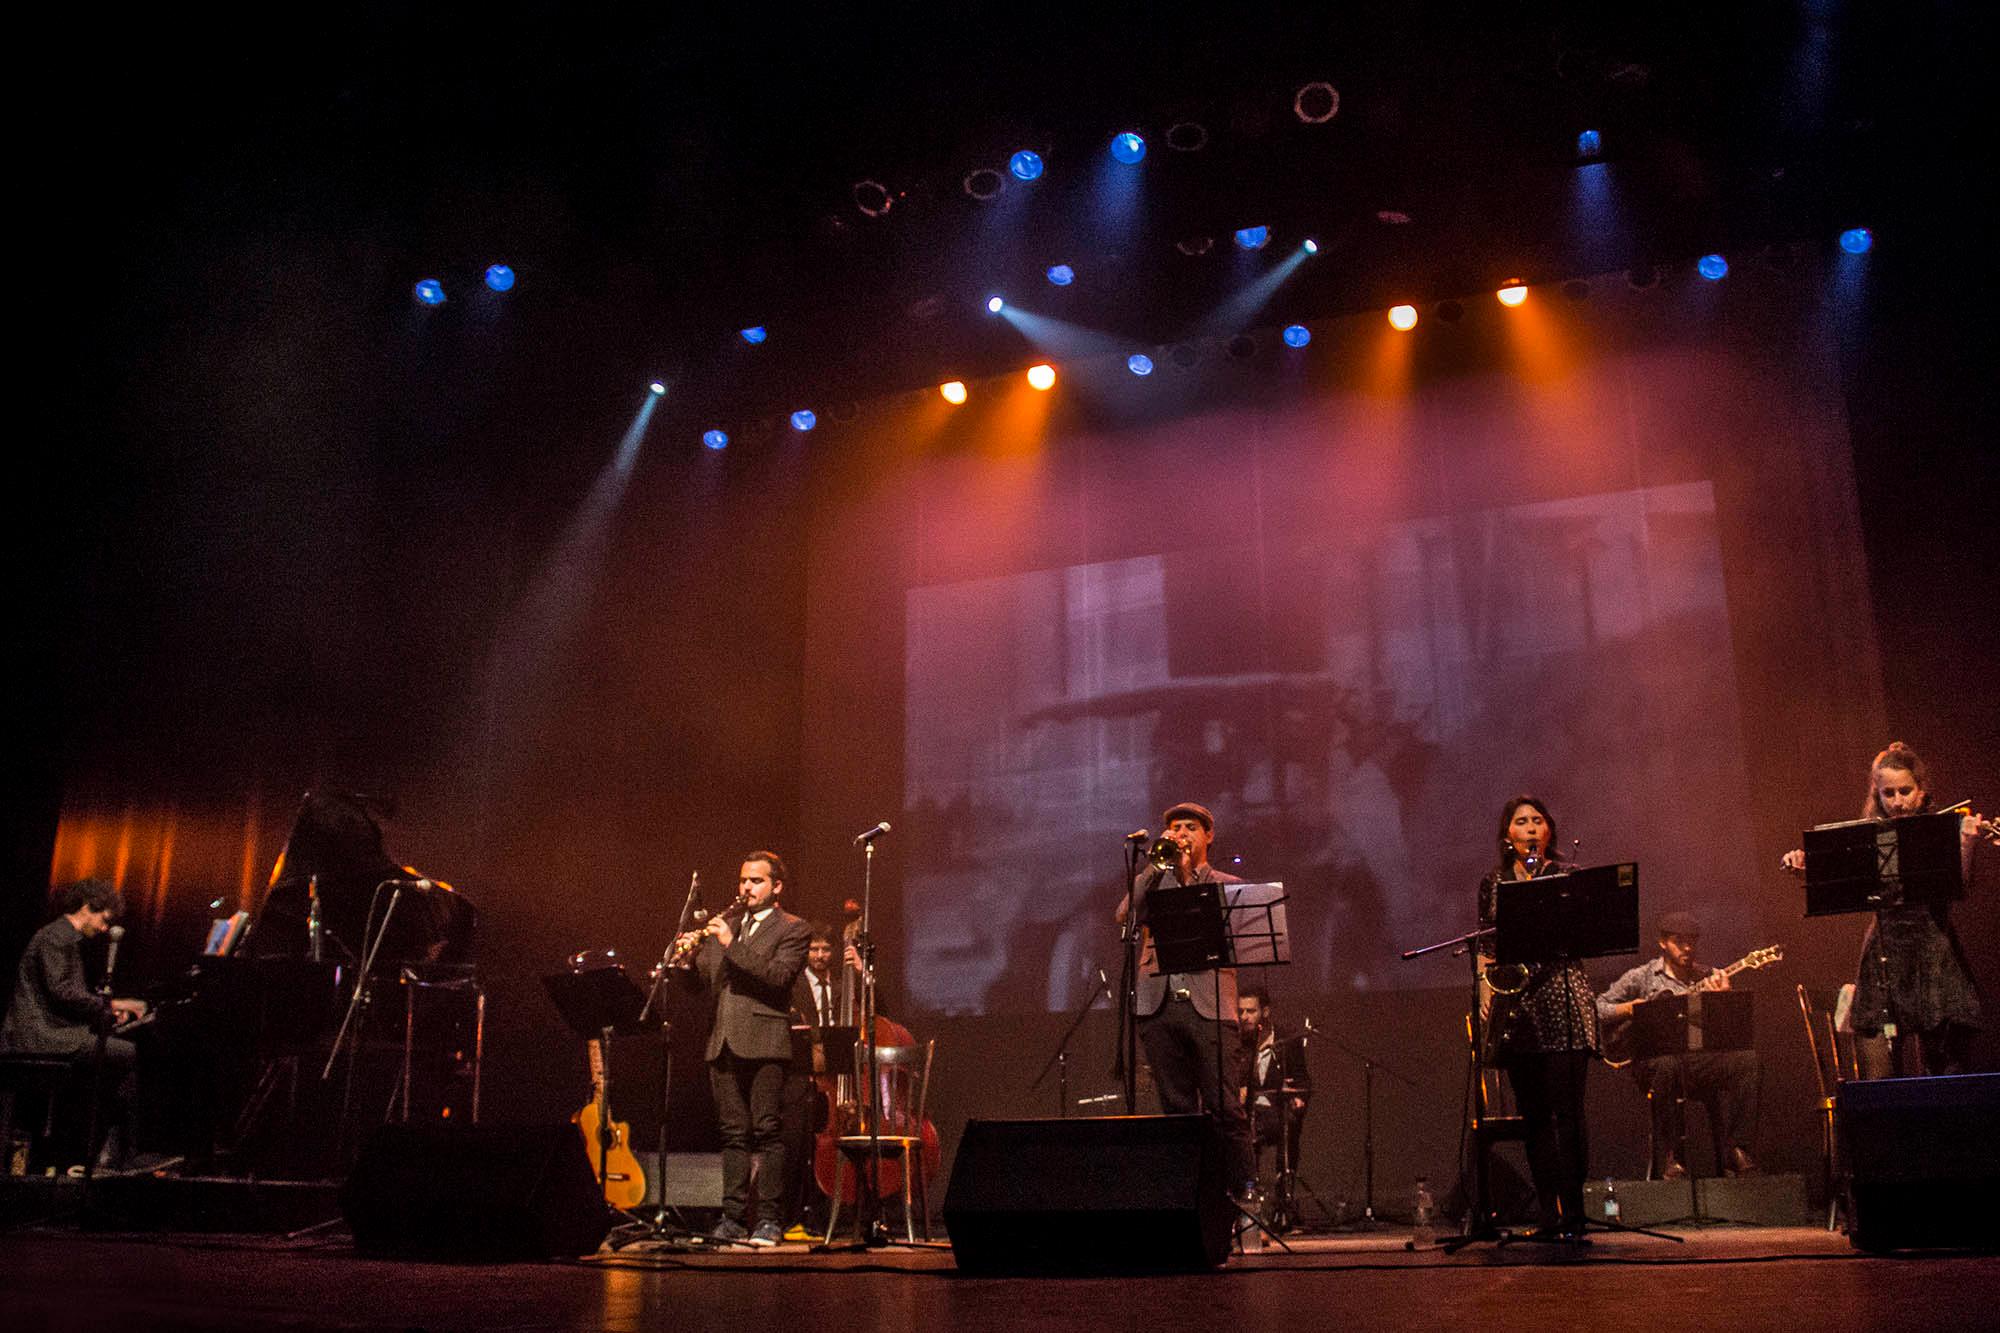 Una agenda musical a puro jazz, funk, pop, tango y folklore - La Capital de Mar del Plata